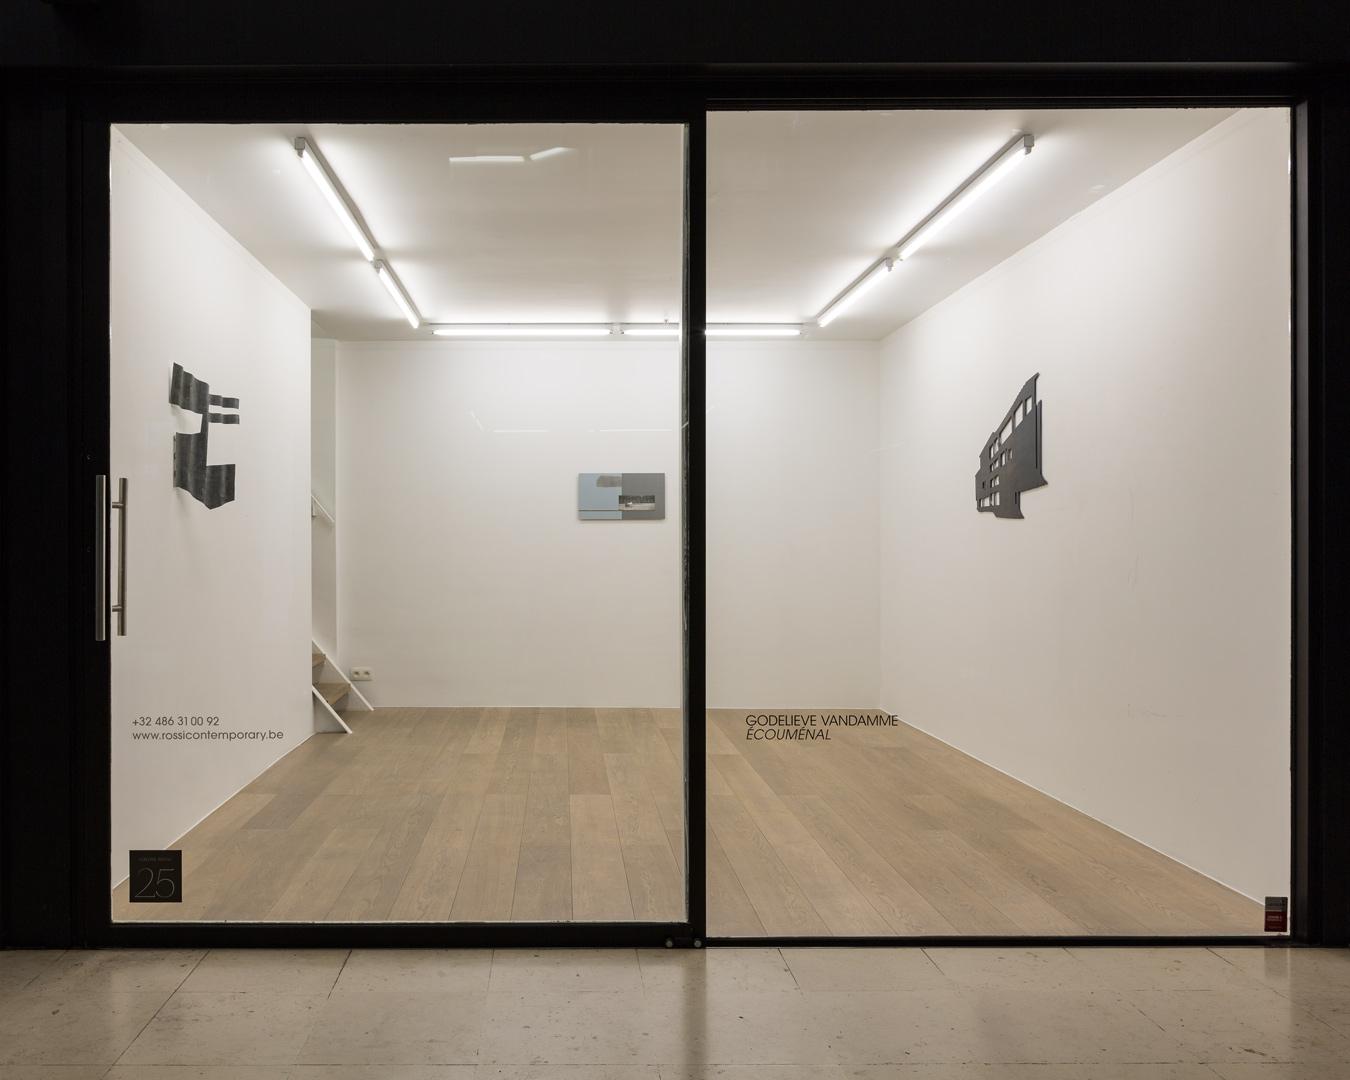 Godelieve Vandamme.  Ecoumenal  Exhibition View – Ground floor